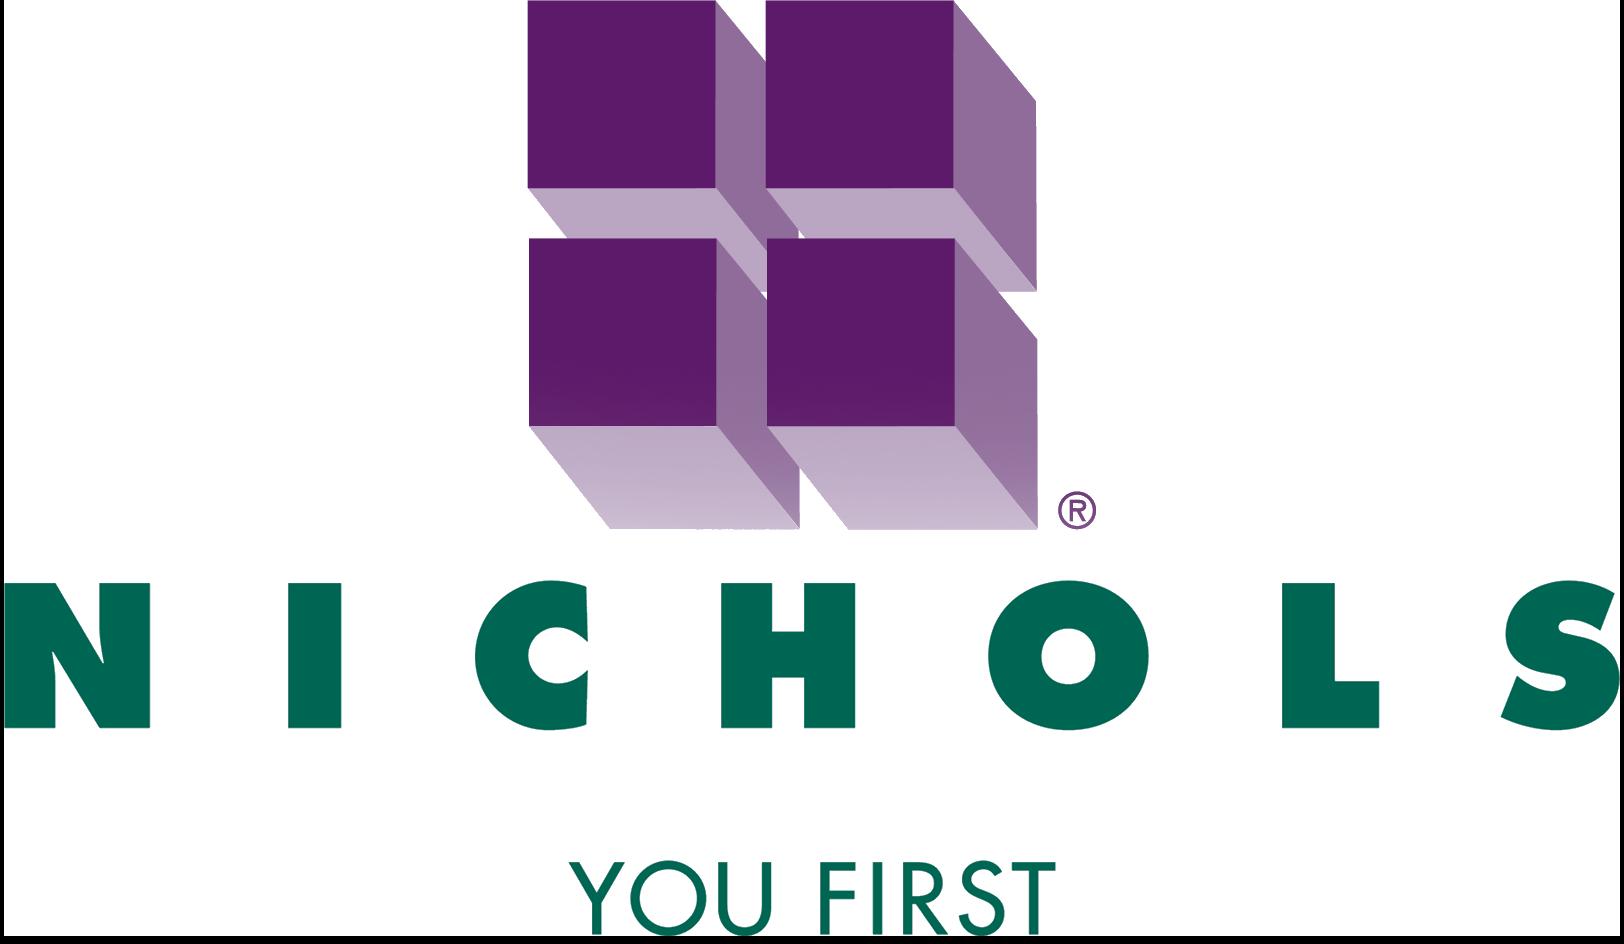 nichols logo 5-19-21